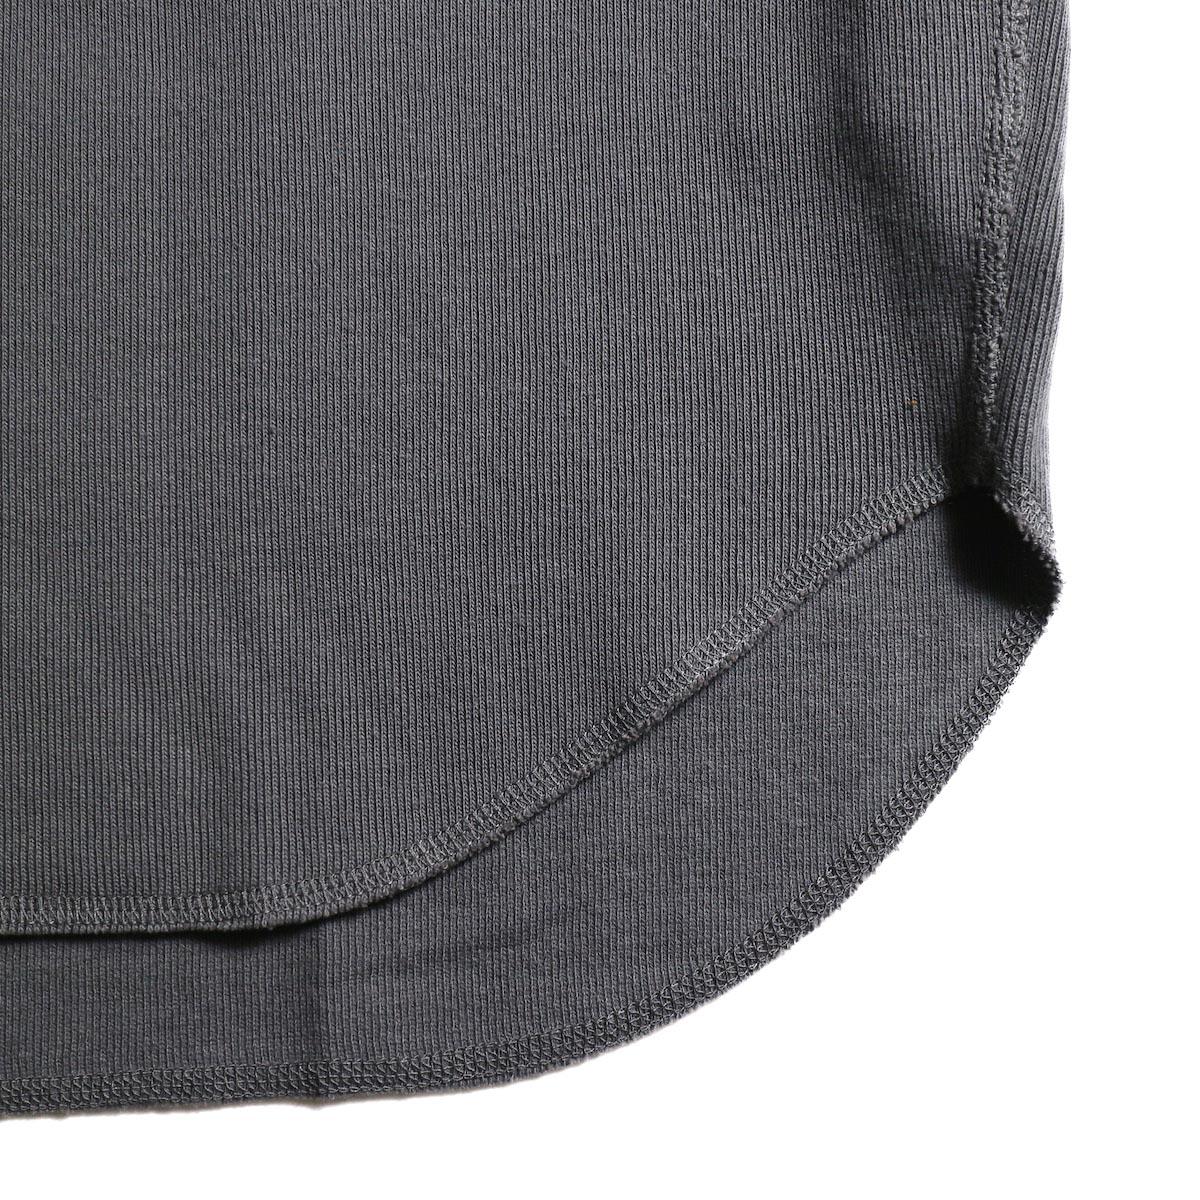 YLEVE / Cotton Rib Pullover (Slate Gray)裾